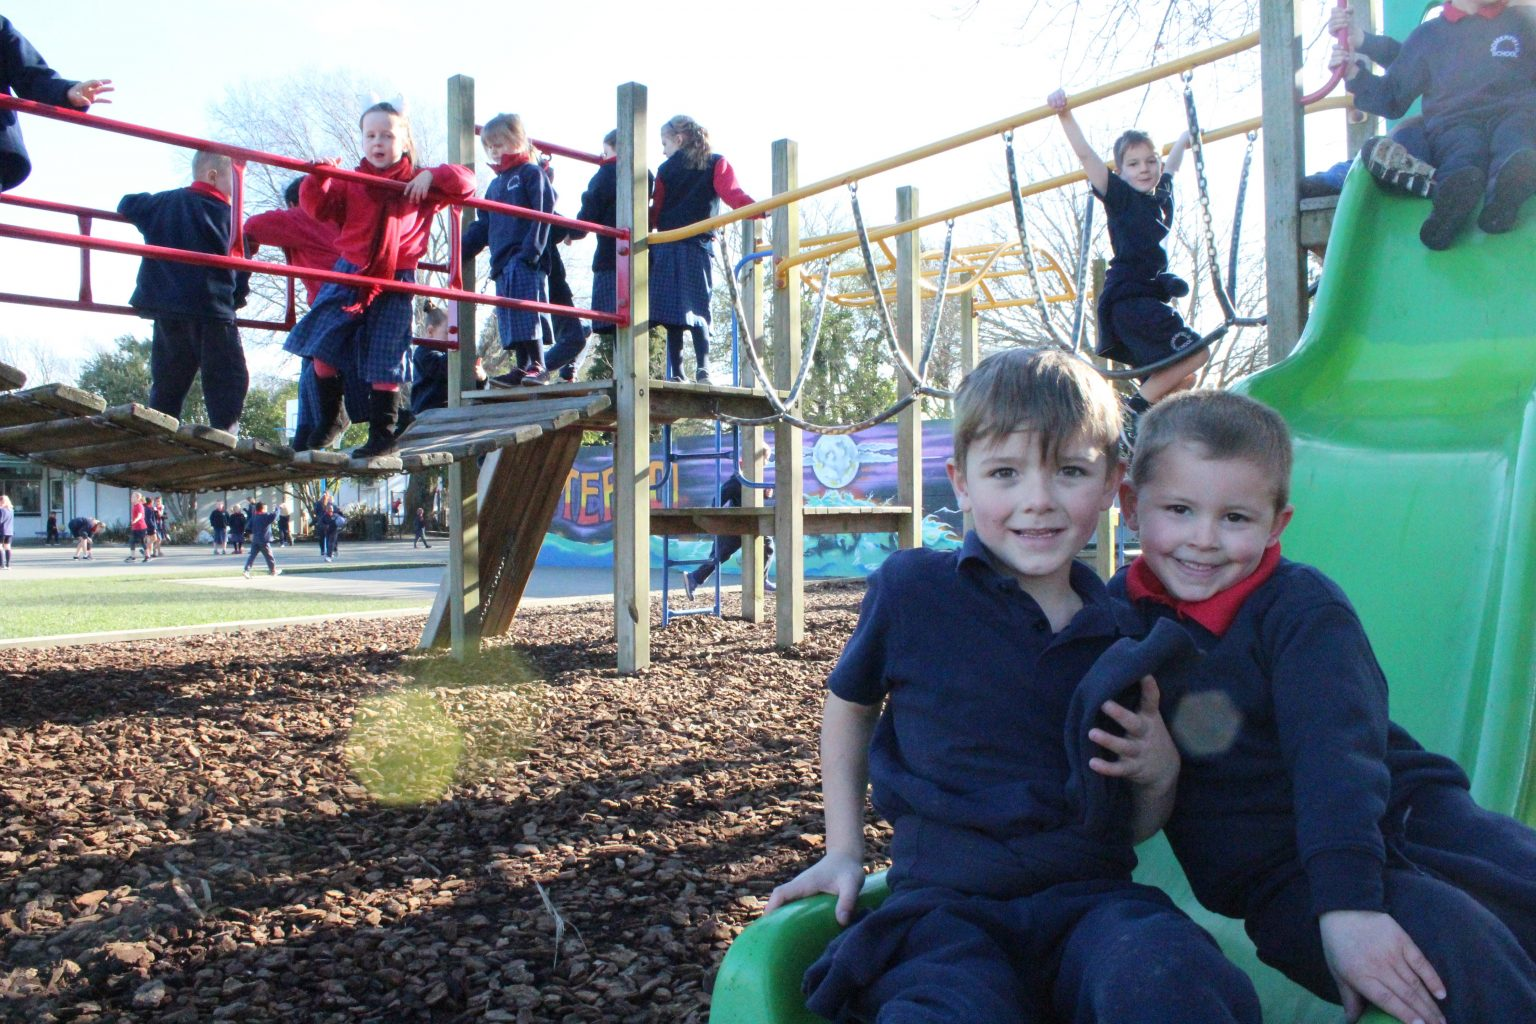 Somerfield Te Kura Wairepo students on a playground